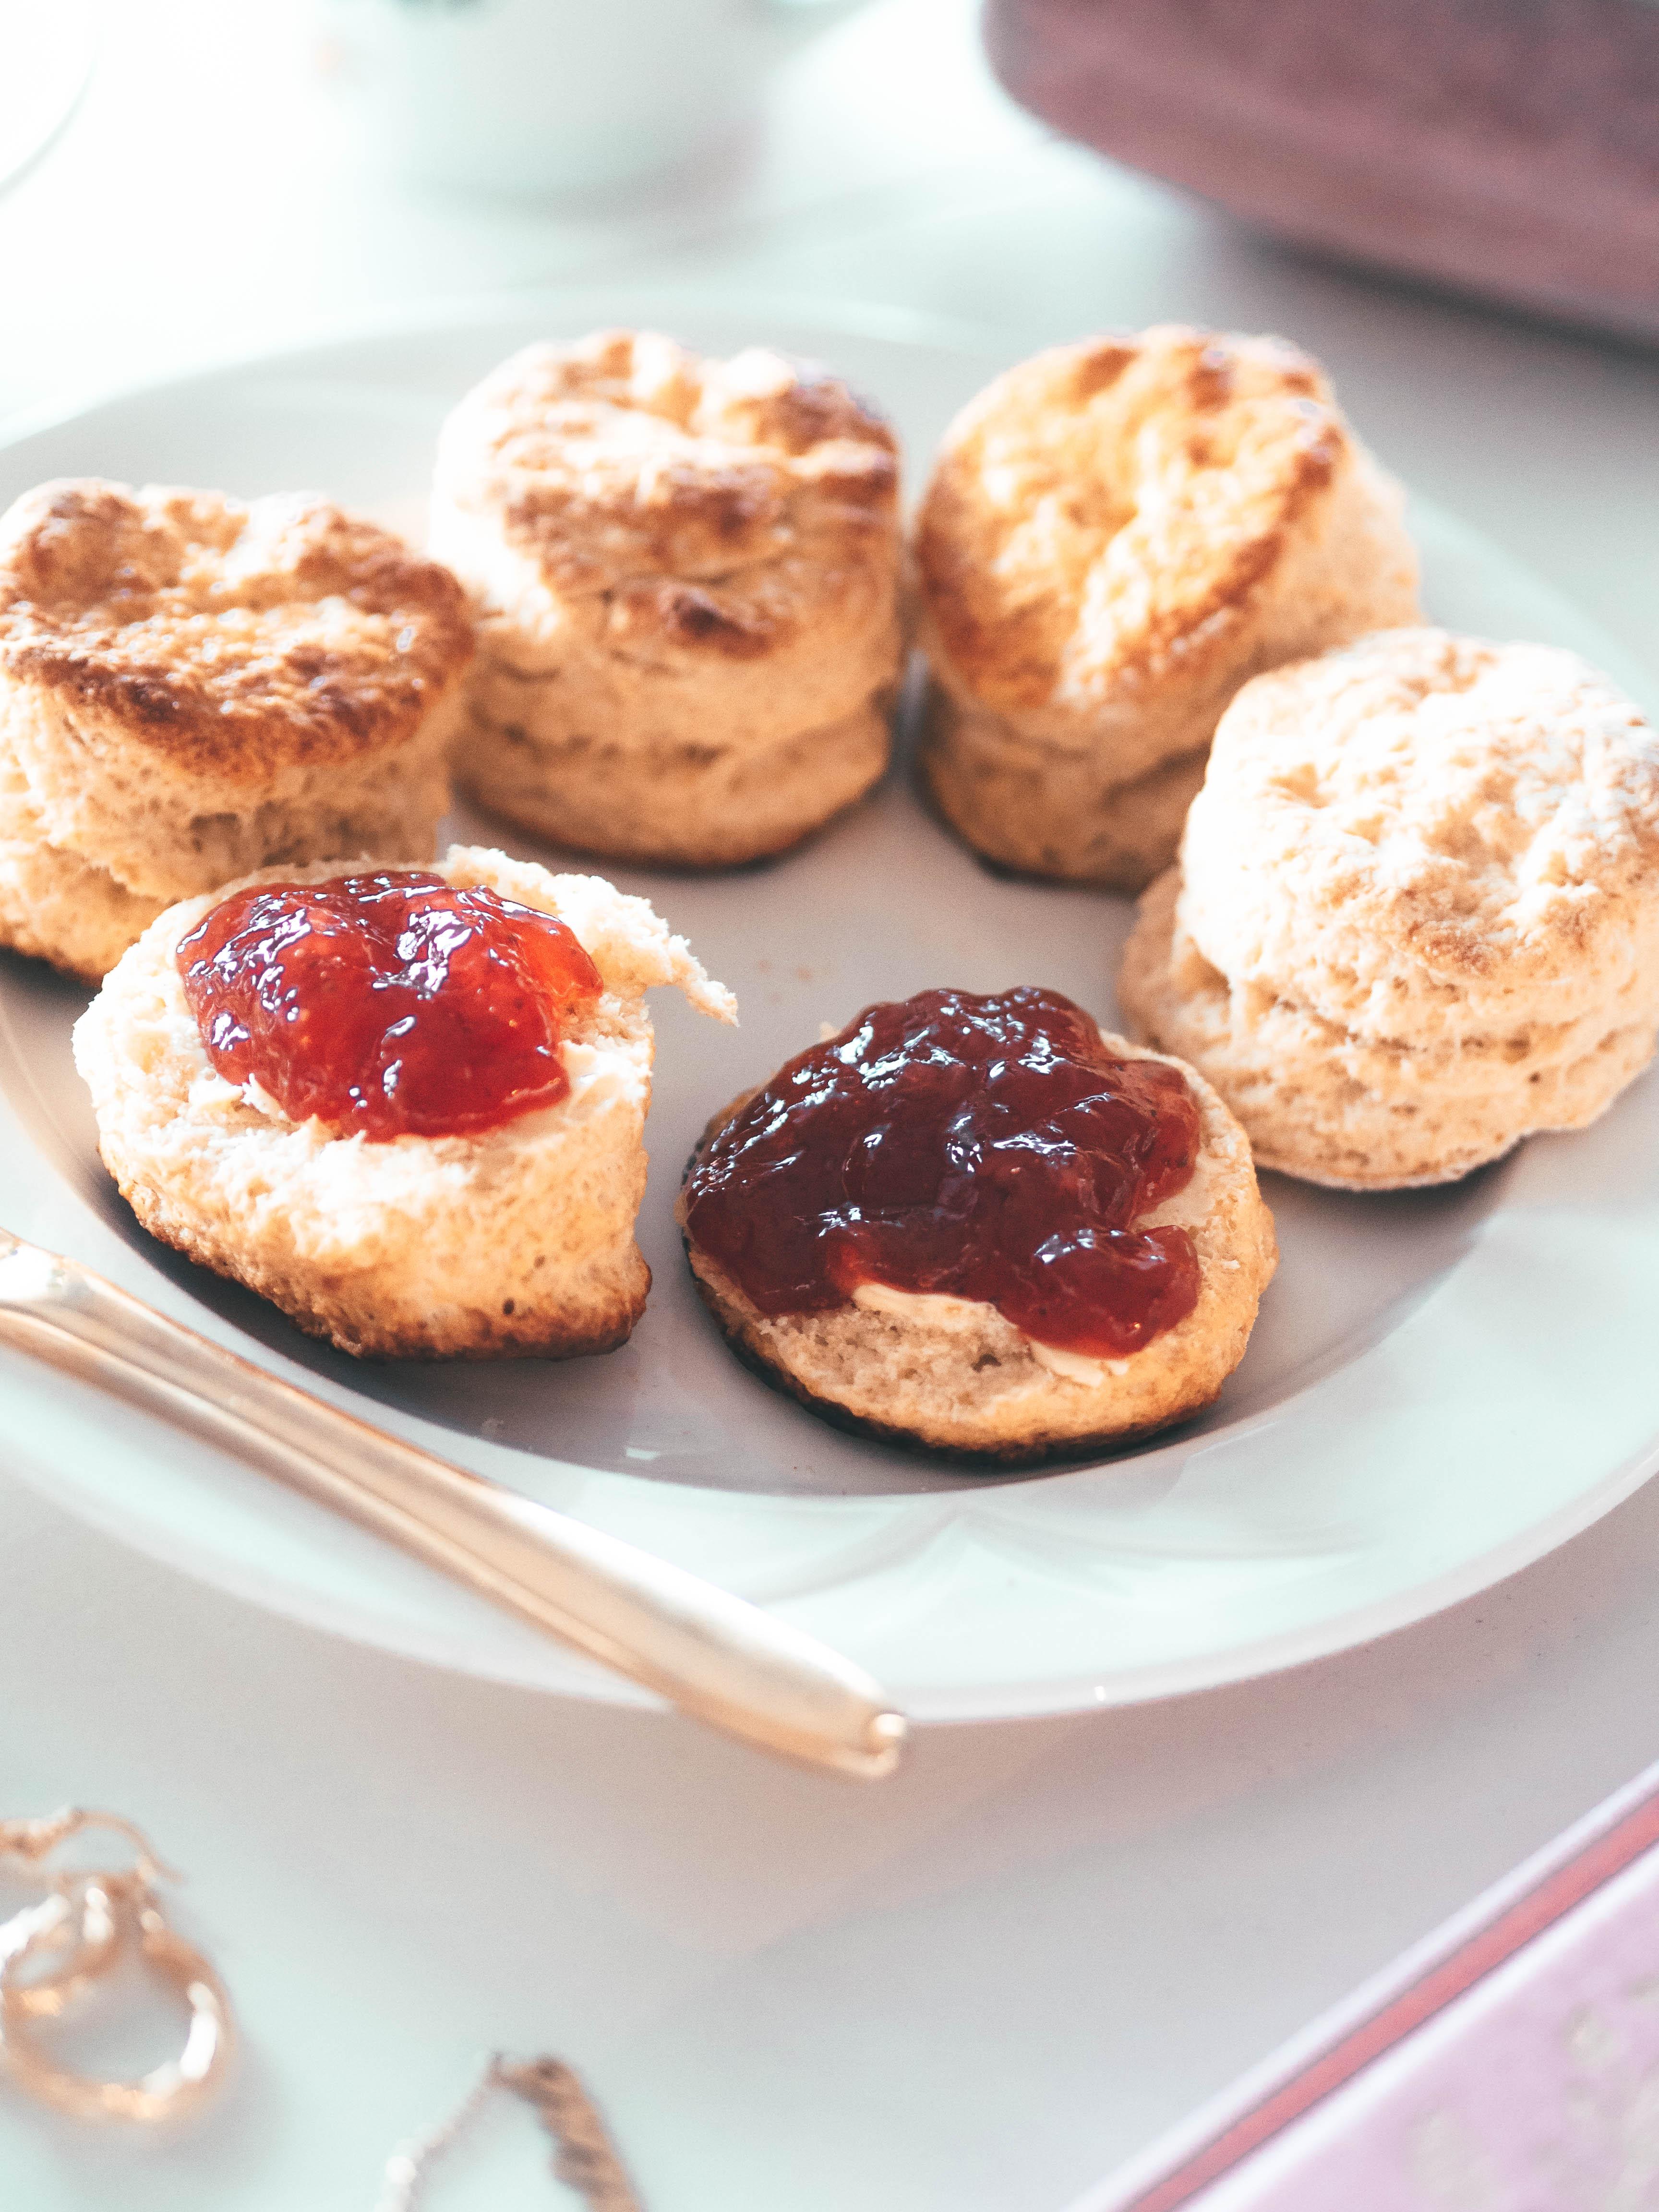 Yasmine's basic buttery scones